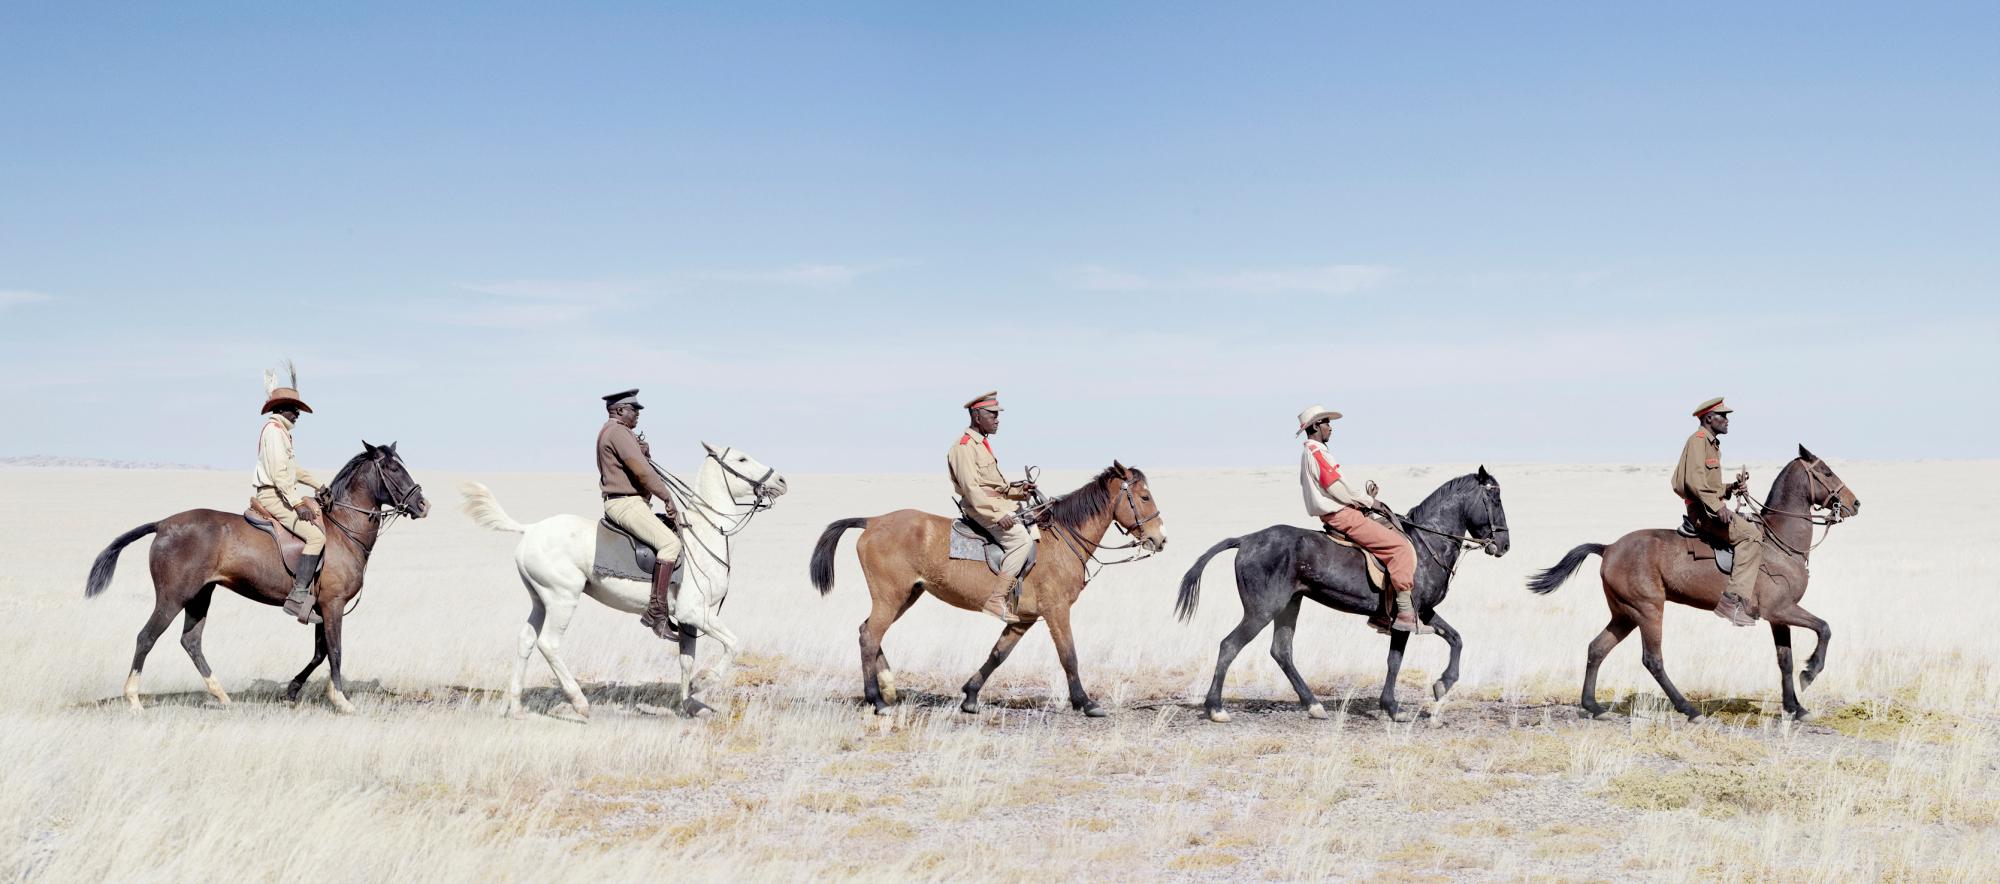 Jim Naughten – Hereros Tribe, Namibia   Second Floor Flat